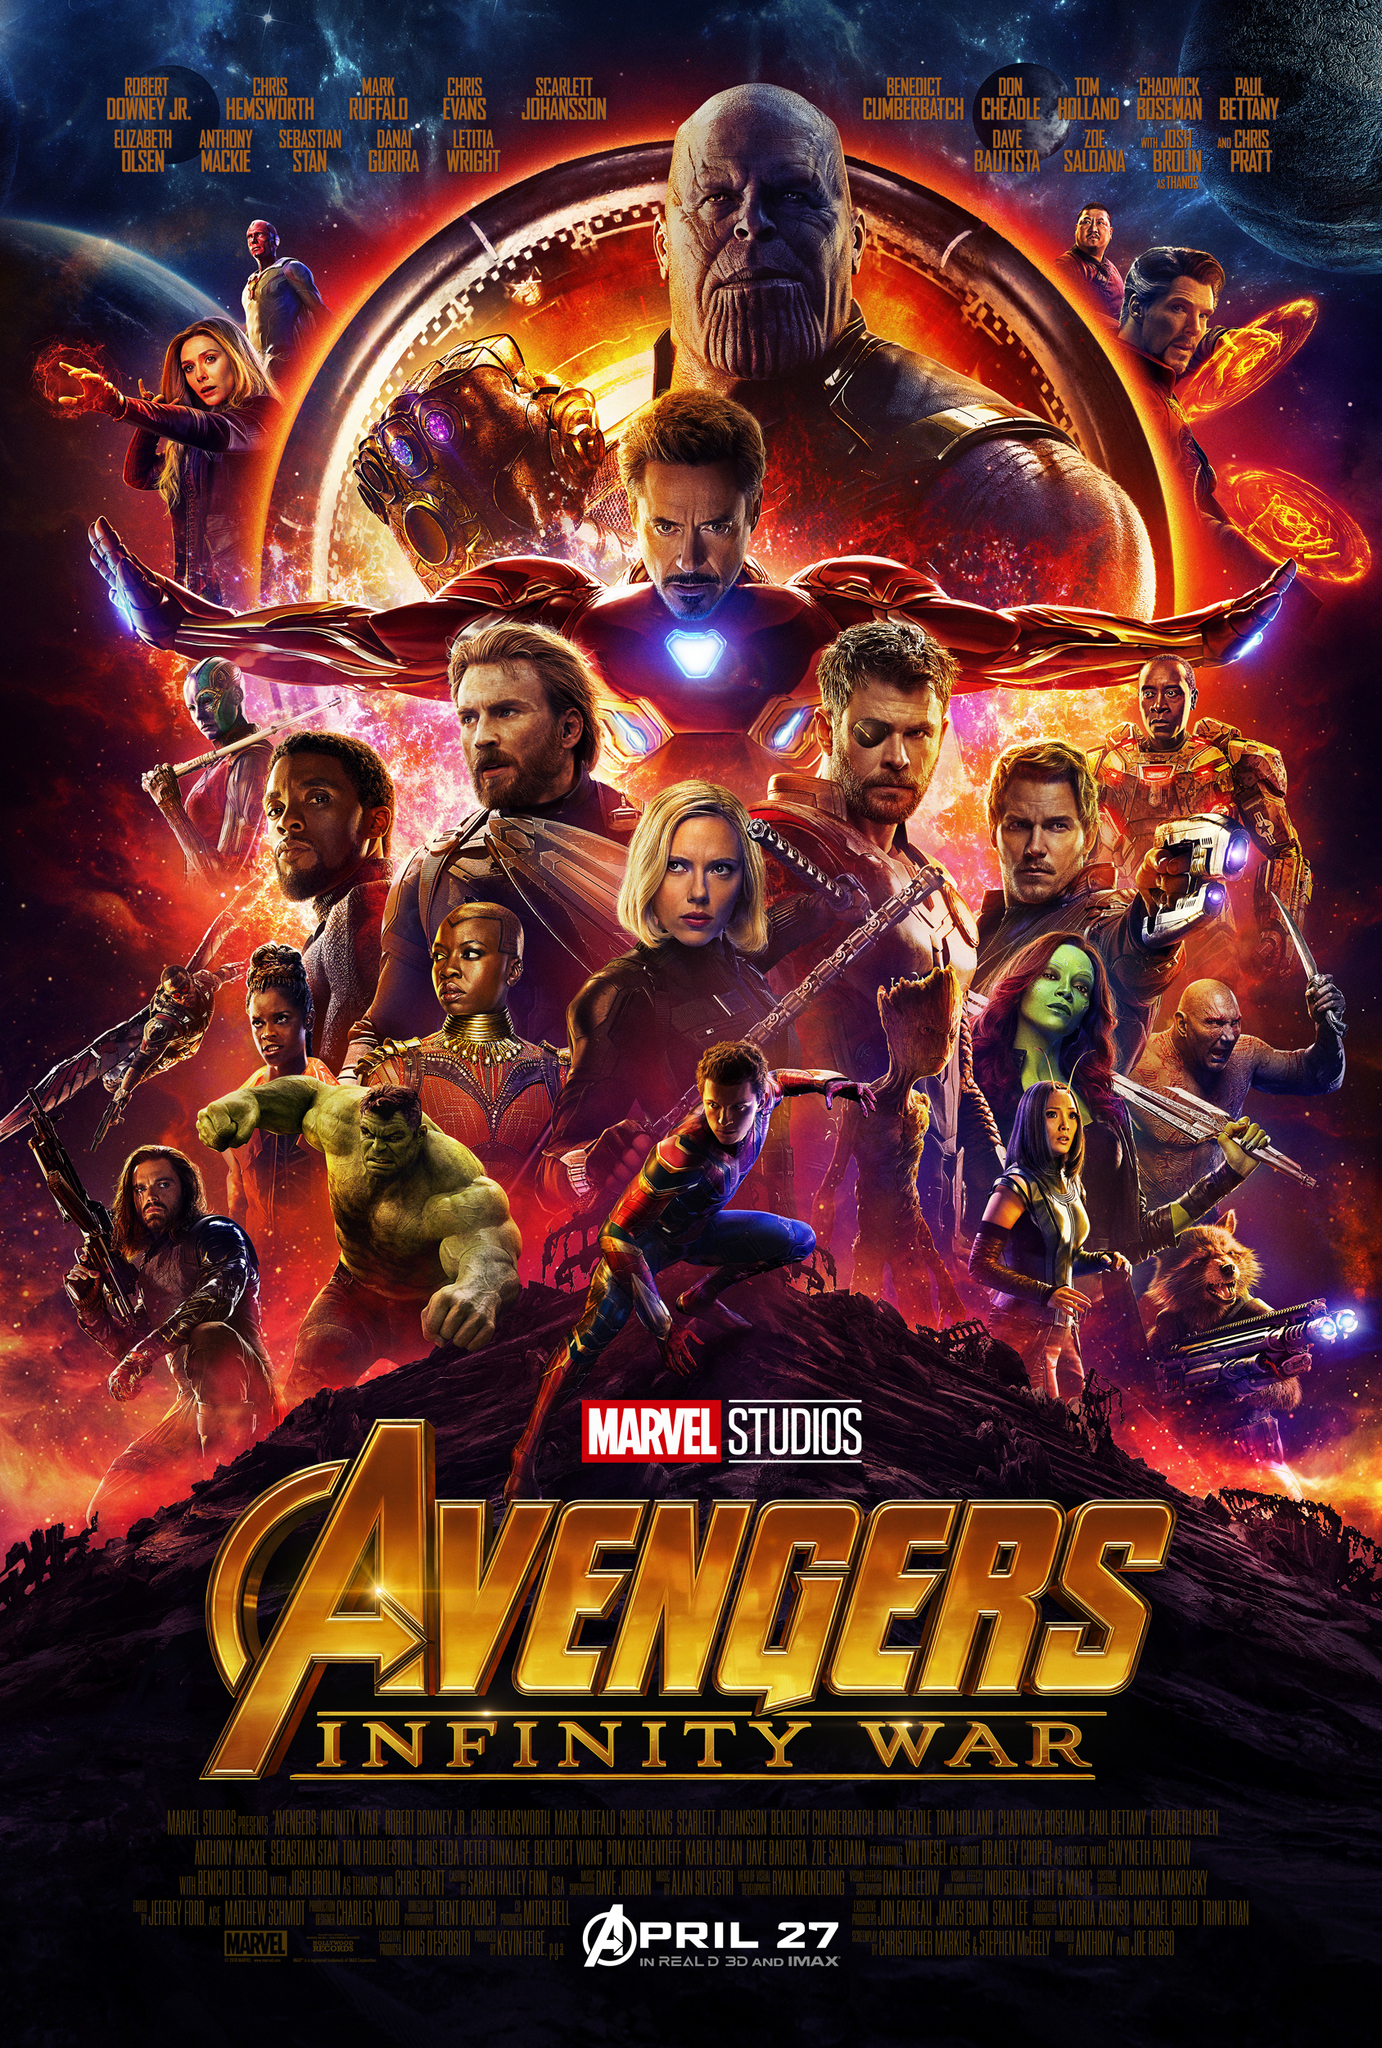 Avengers: Infinity War (2018) Dual Audio [Hindi+English] Full Movie 480p, 720p, 1080p GDrive Download & Watch Watch Online